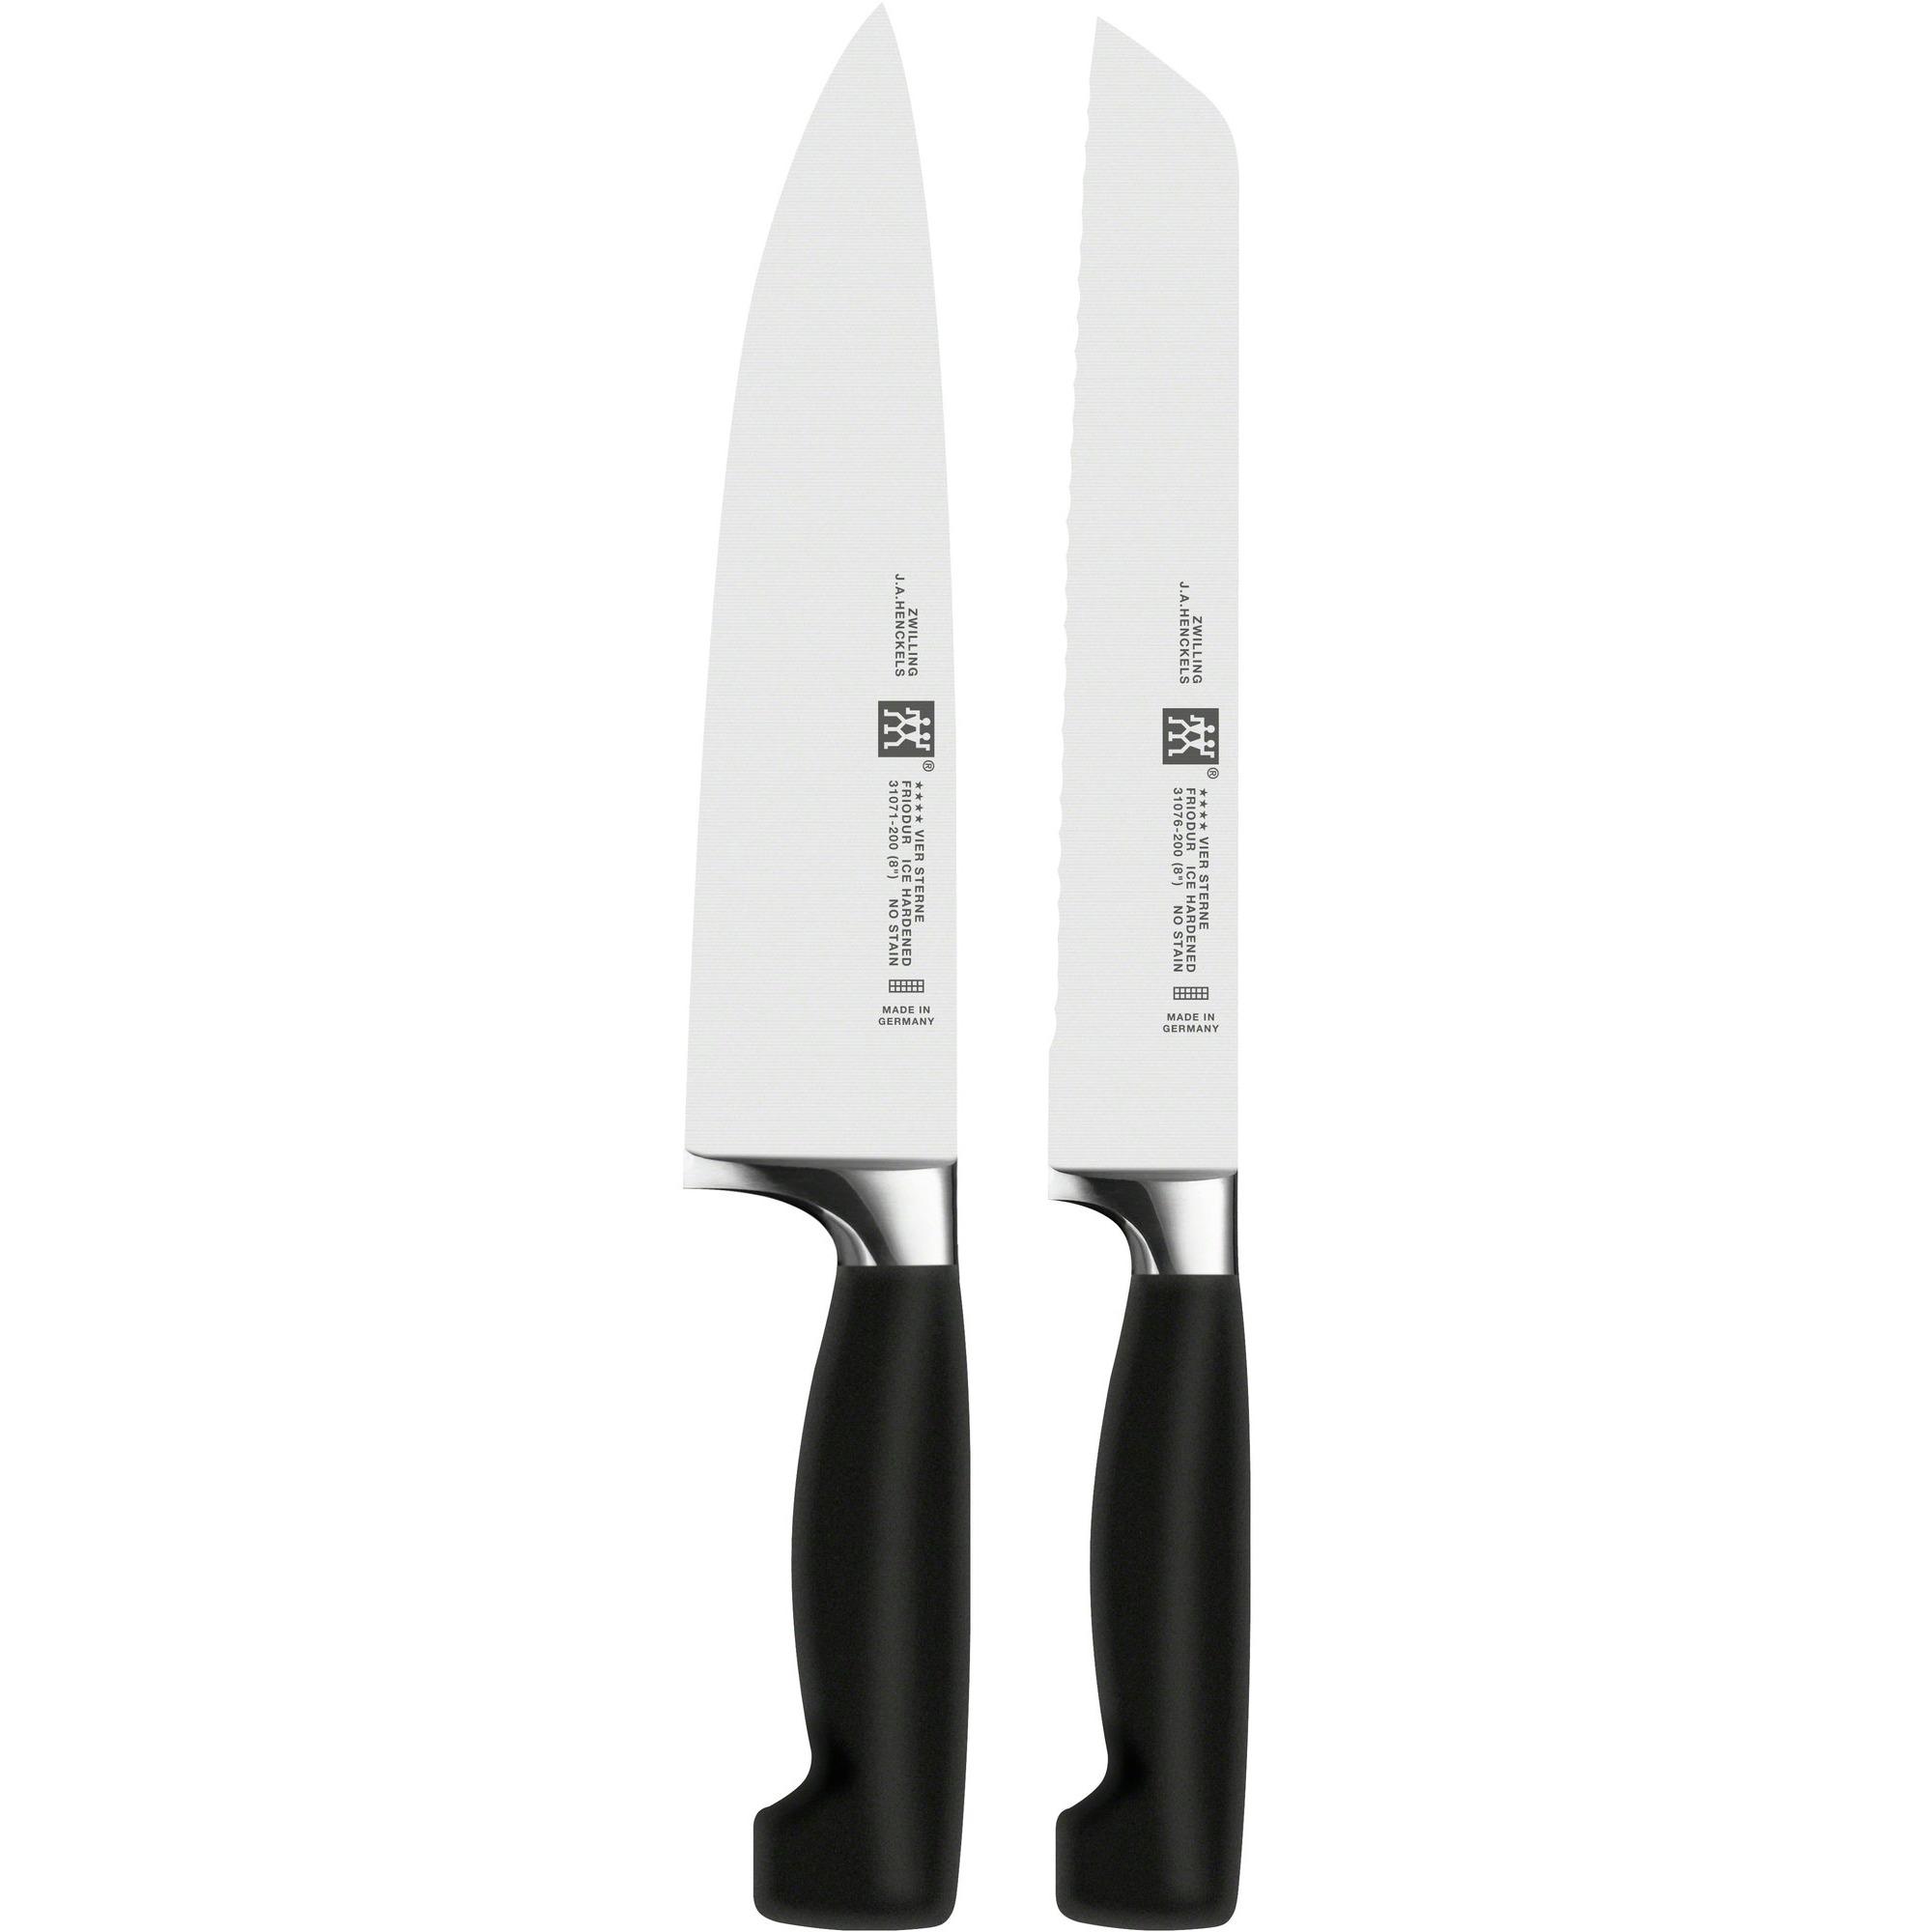 Zwilling Knivset Twin Four Star Brödkniv 20 cm +Kockkniv 20 cm